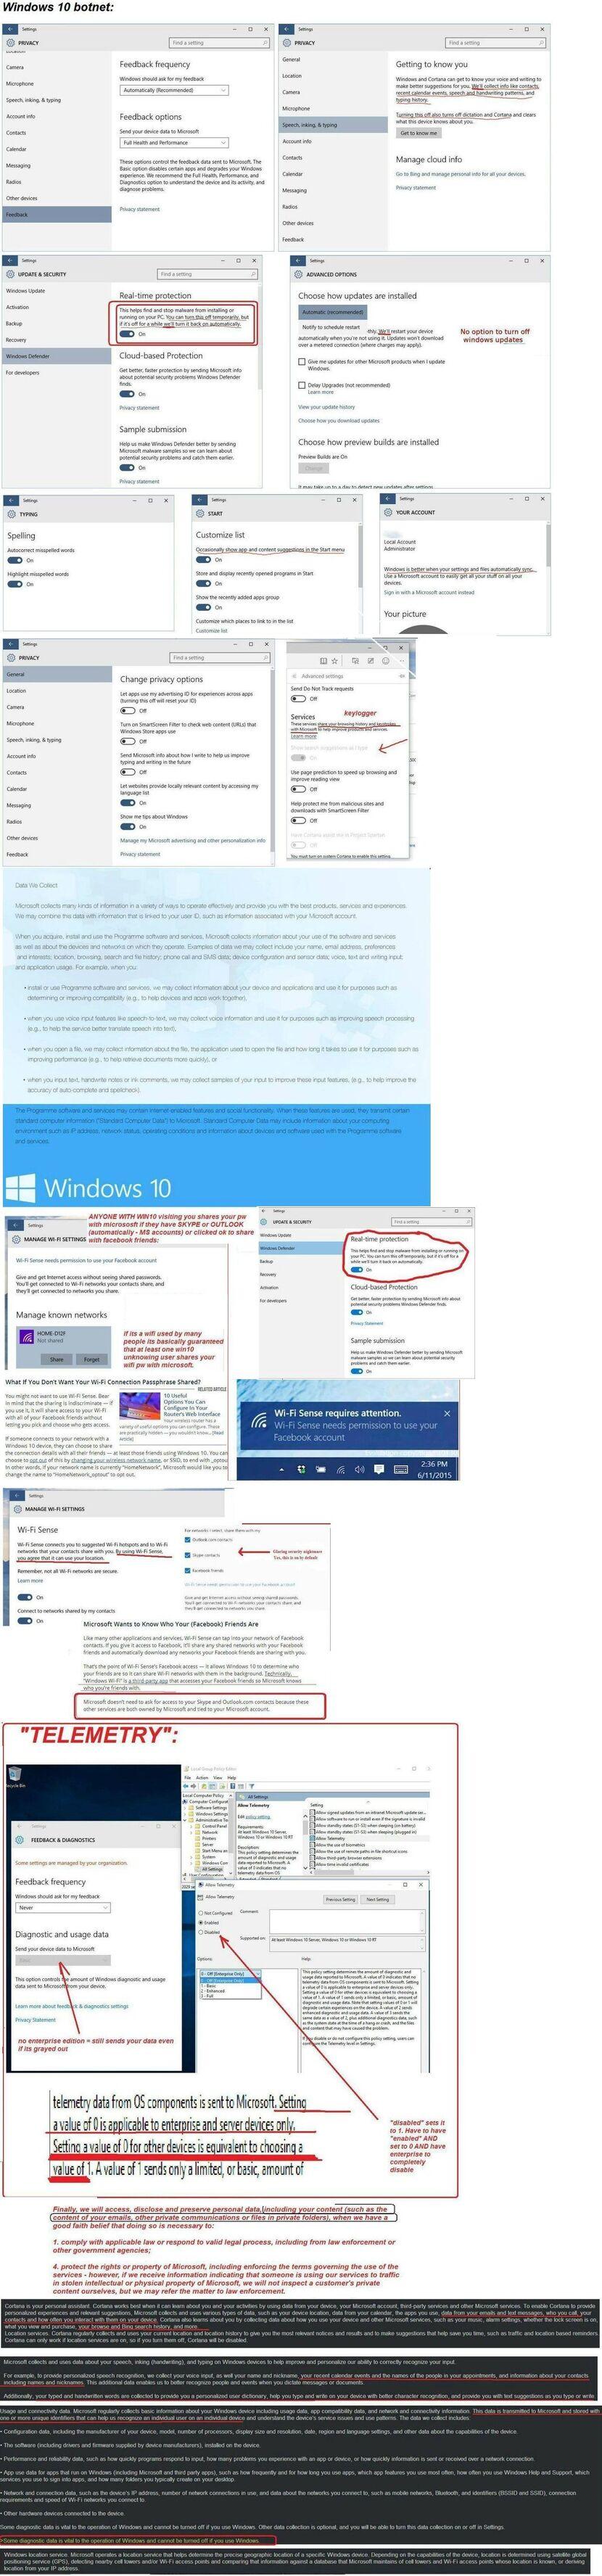 Windows 10 BotNet